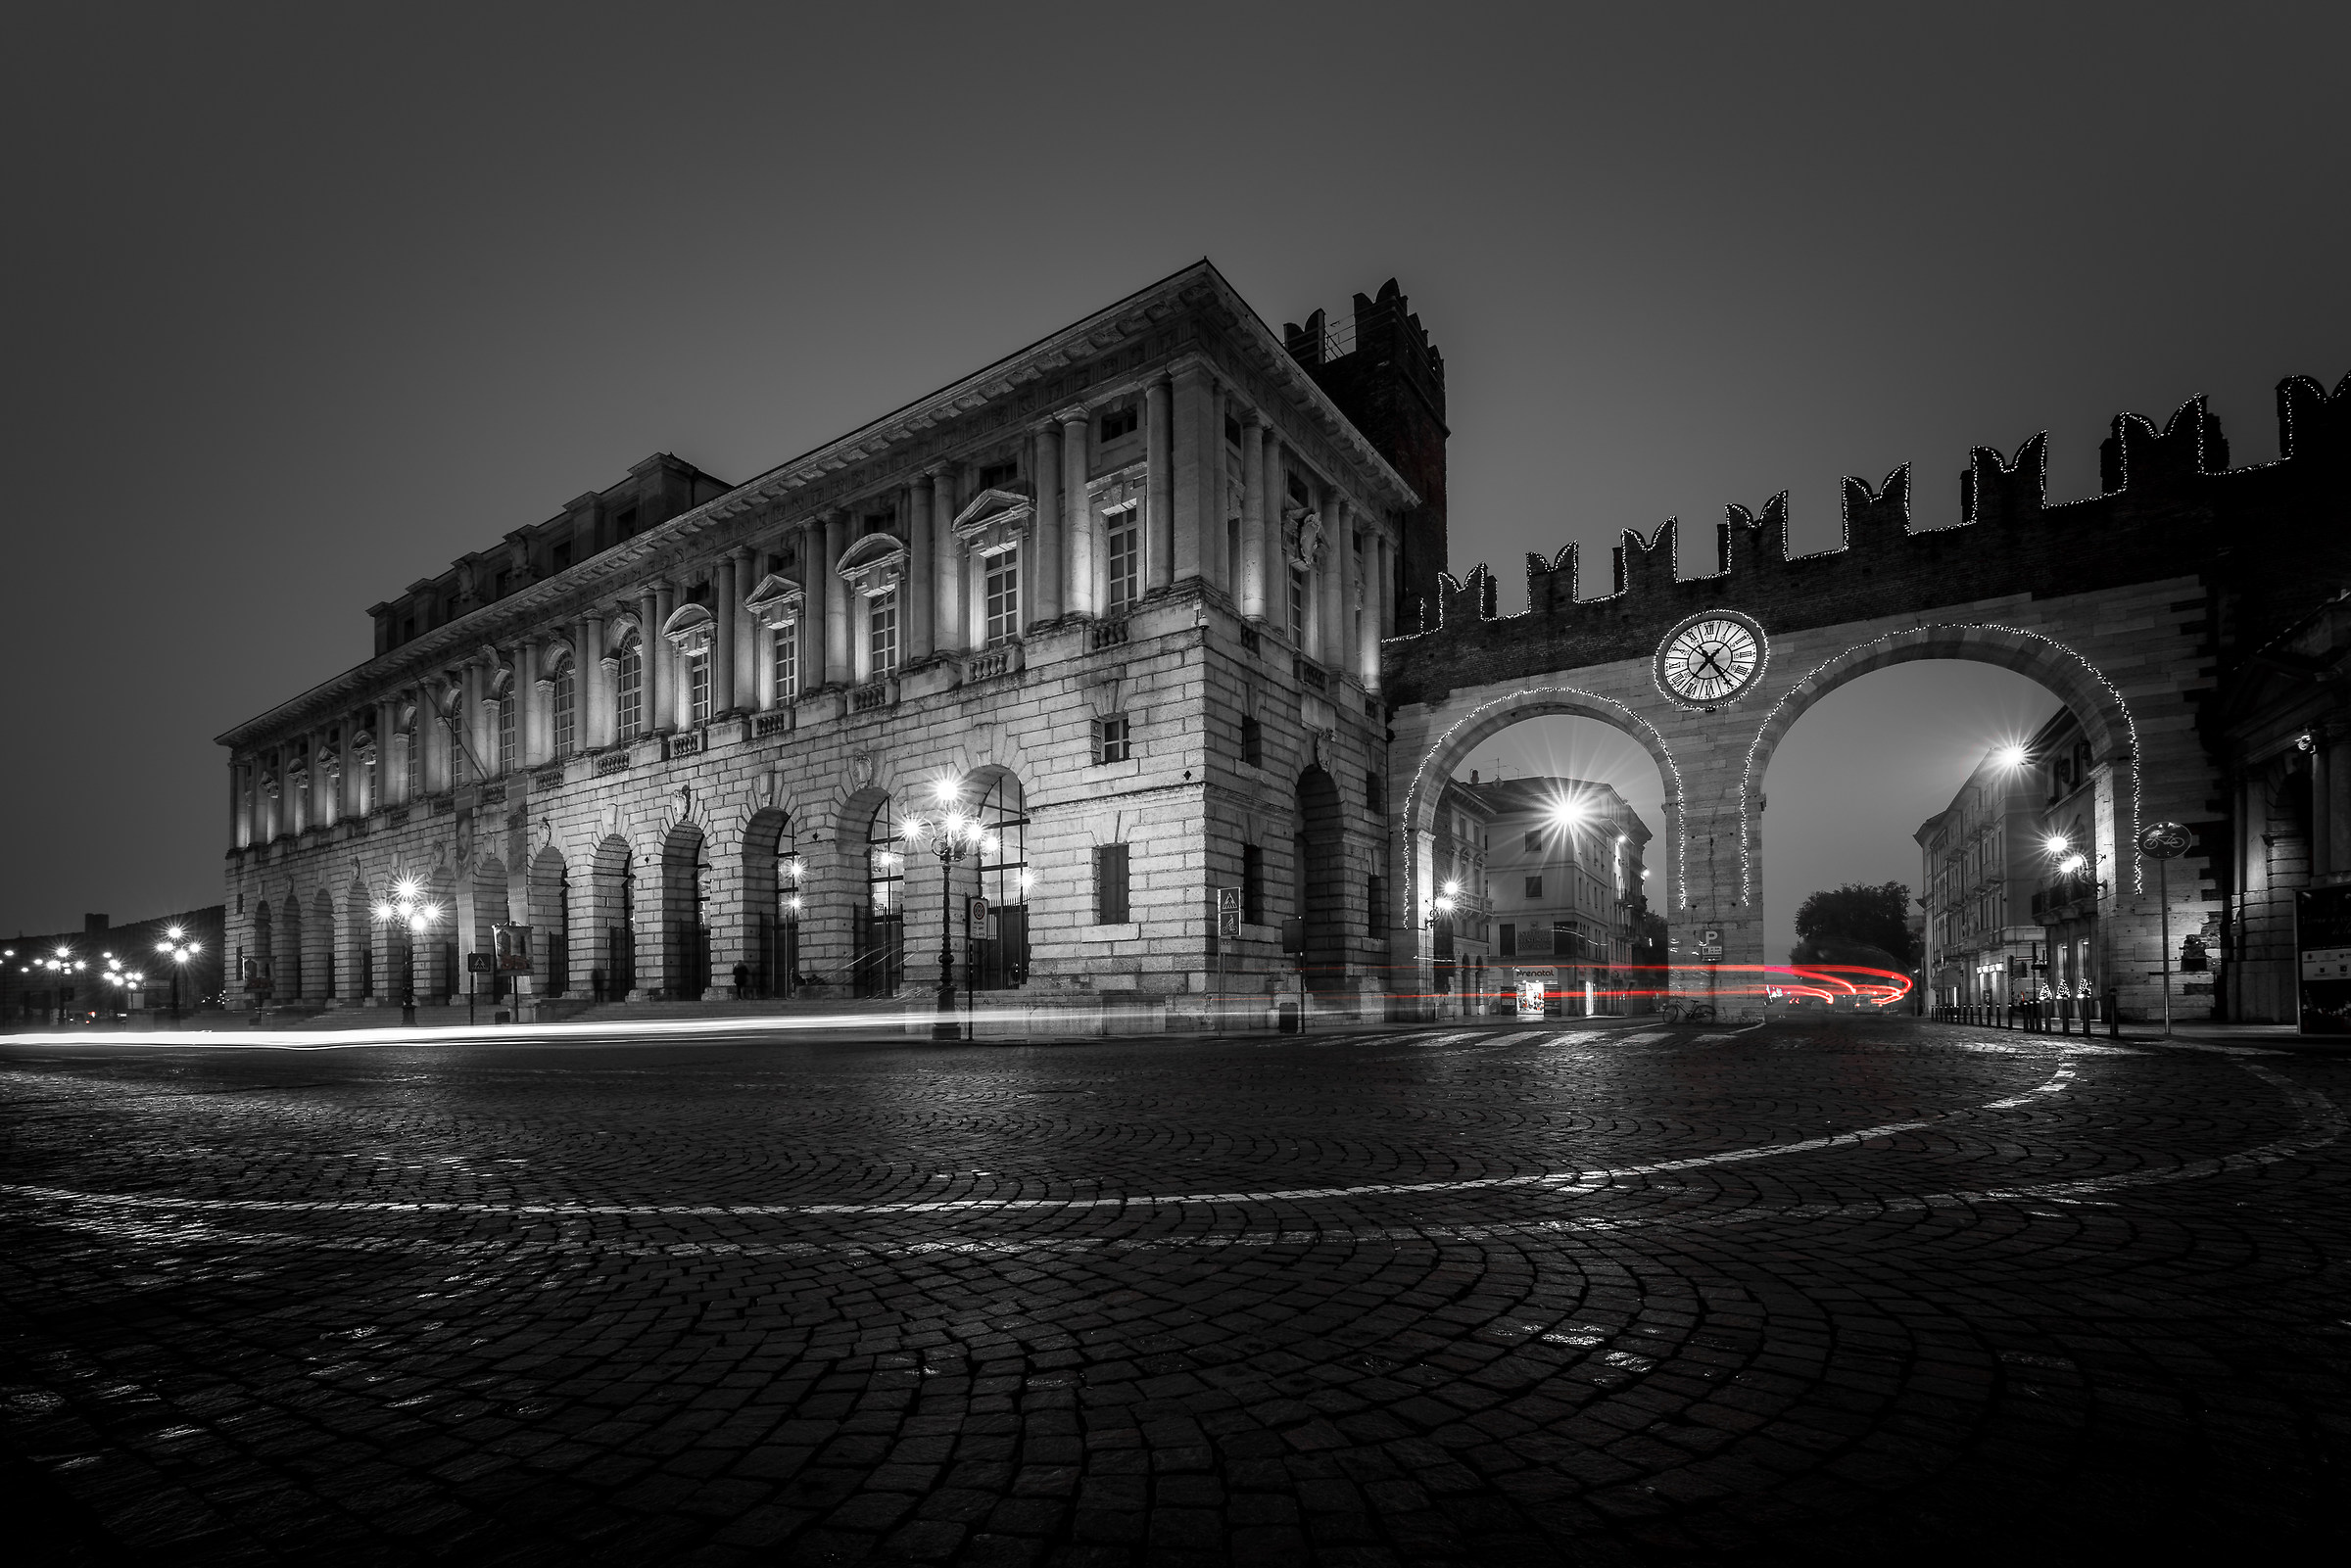 Palace of Granguardia - Piazza Bra - Verona...